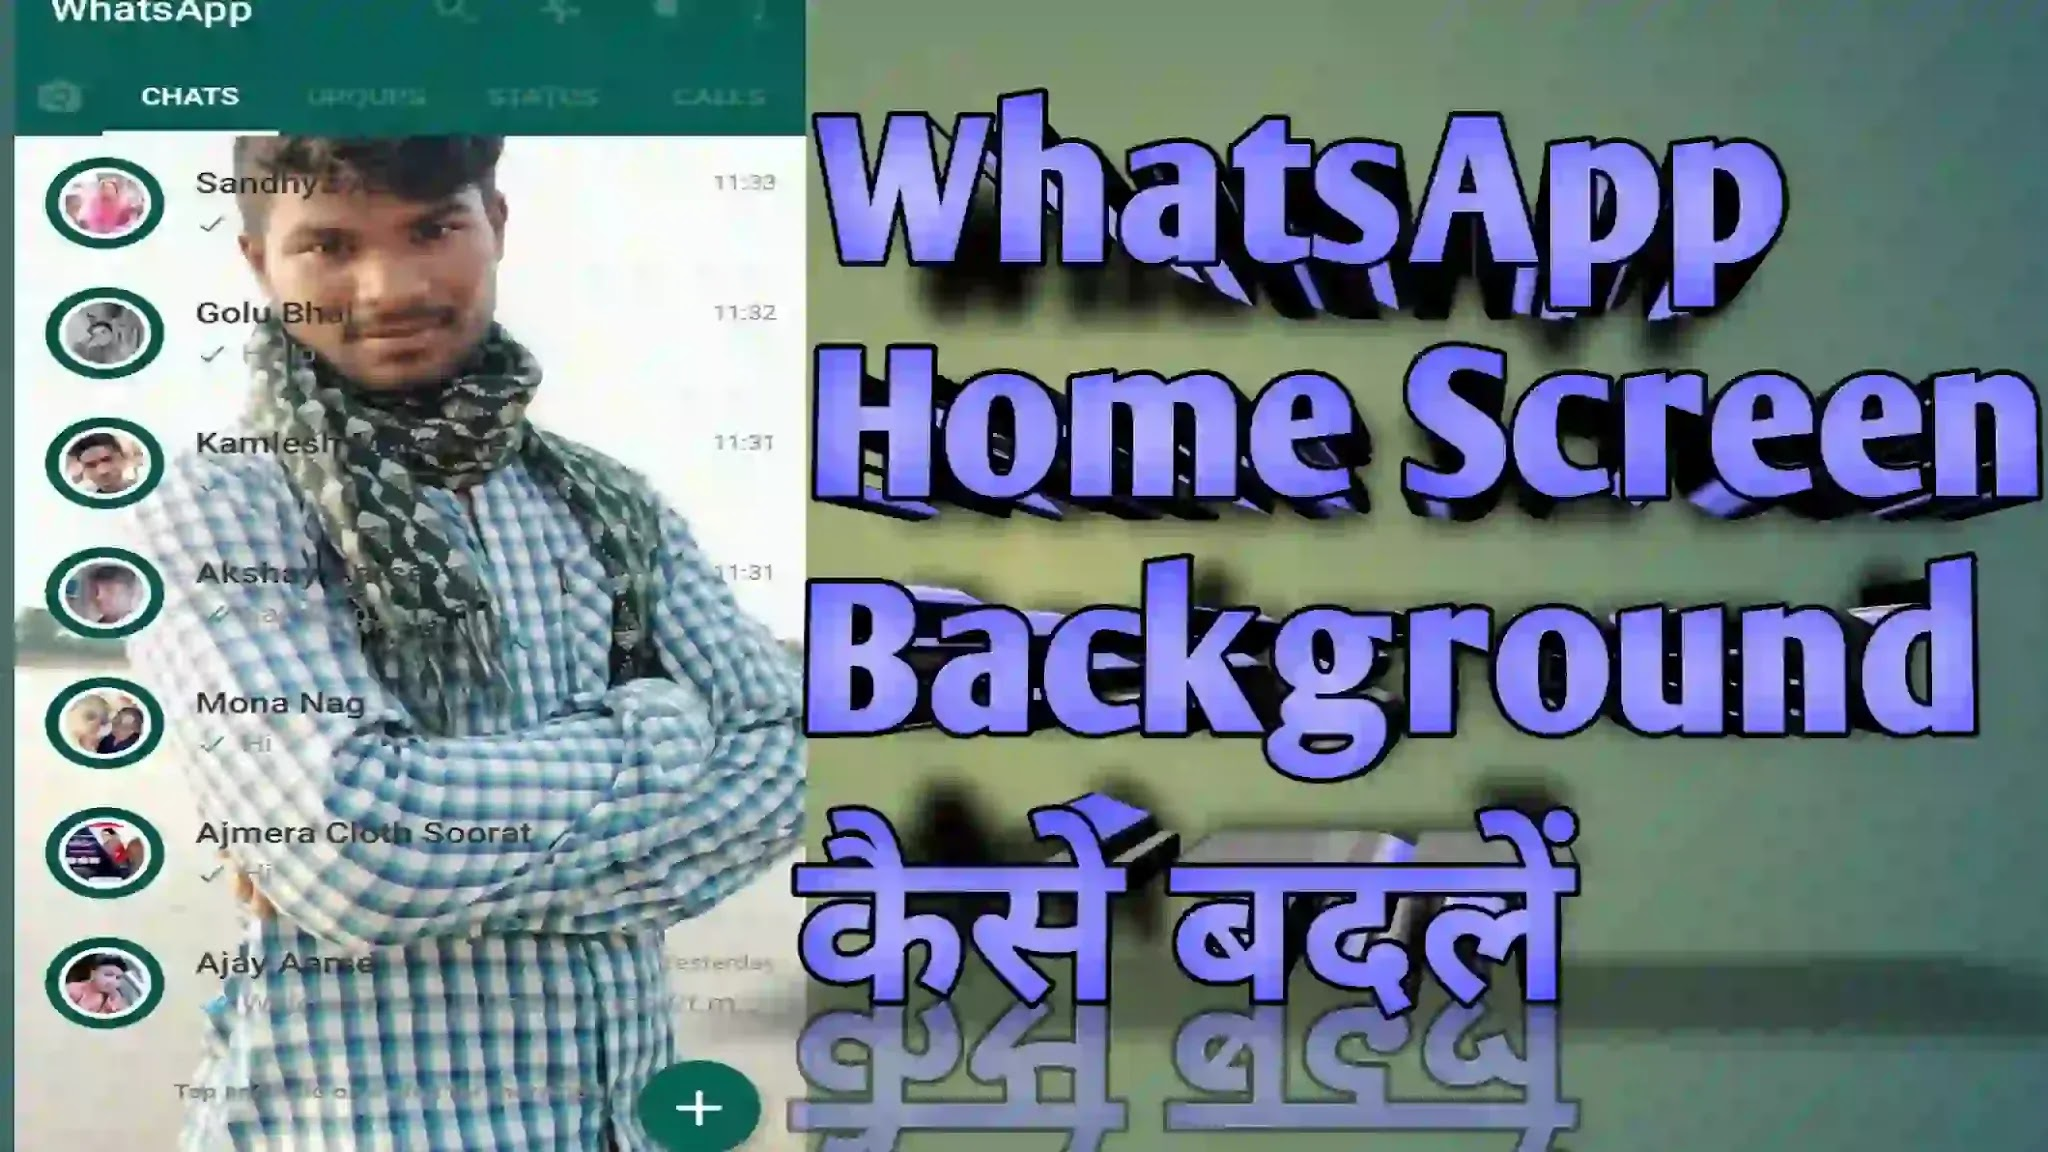 Whatsapp Home Screen Wallpaper